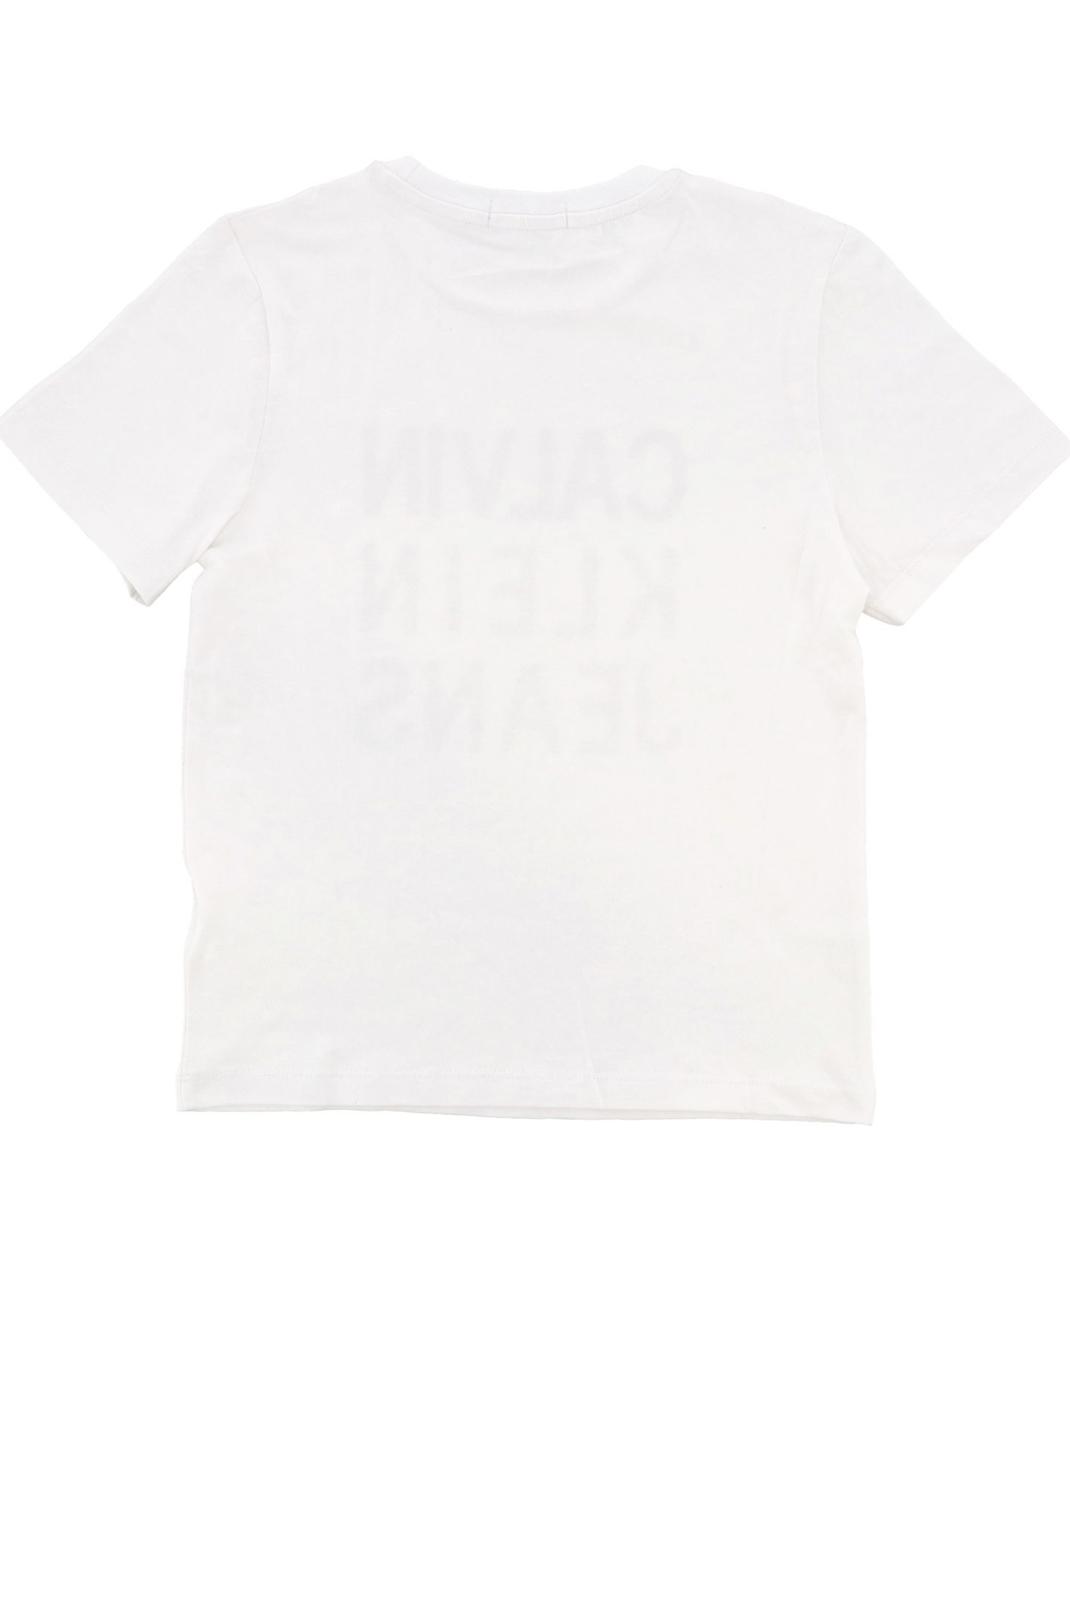 Hauts  Calvin klein IB0IB00325-YAF- Bright White